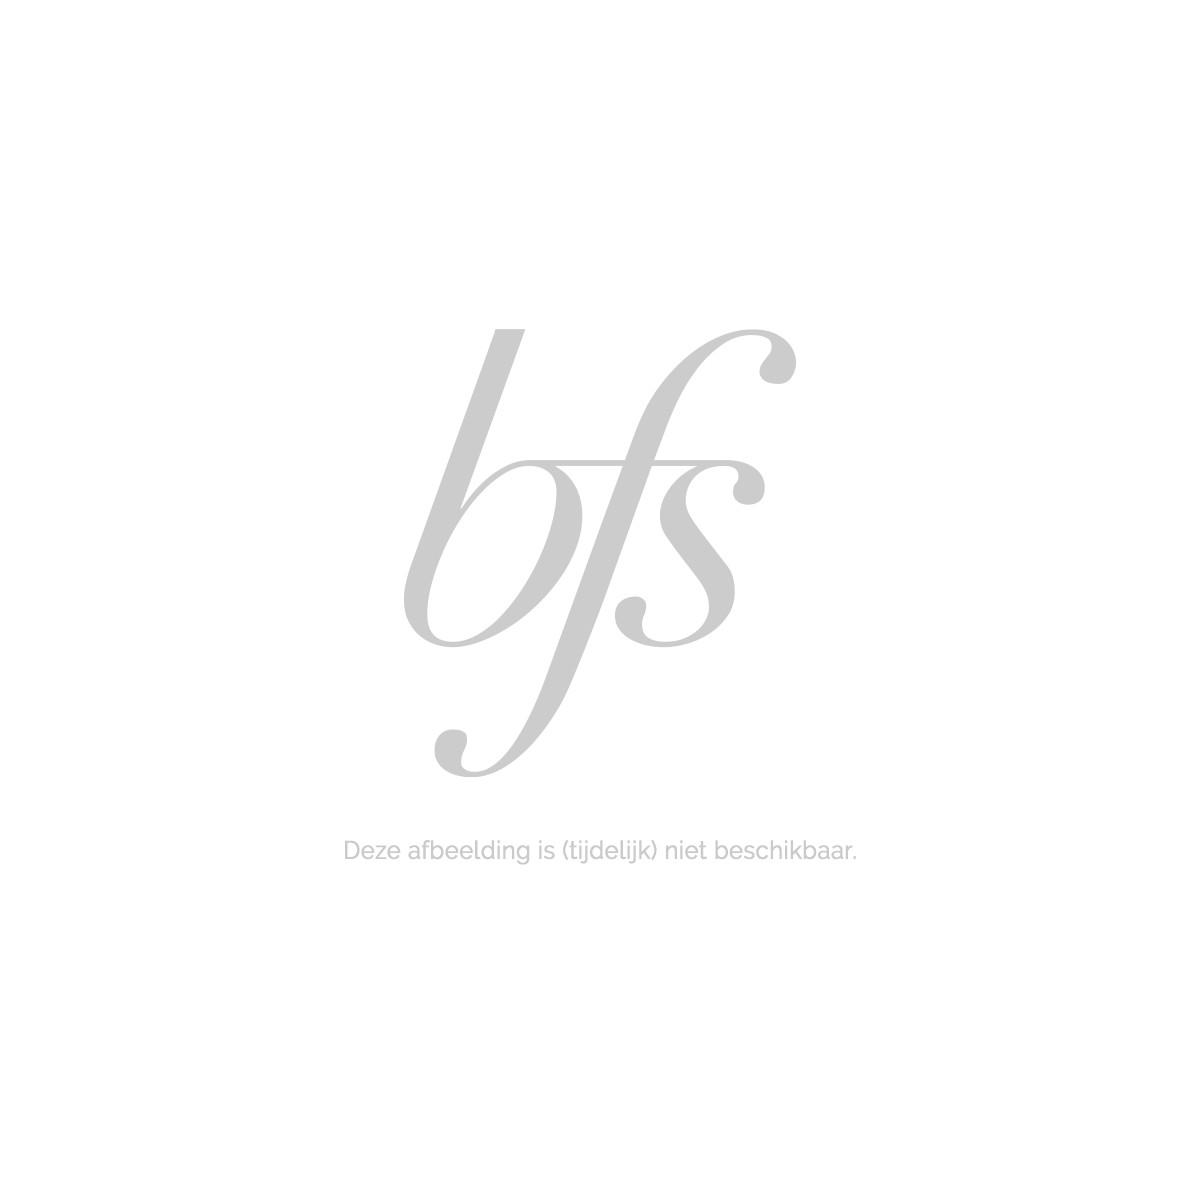 Pupa Smoothing Foundation Primer 03 Lilac